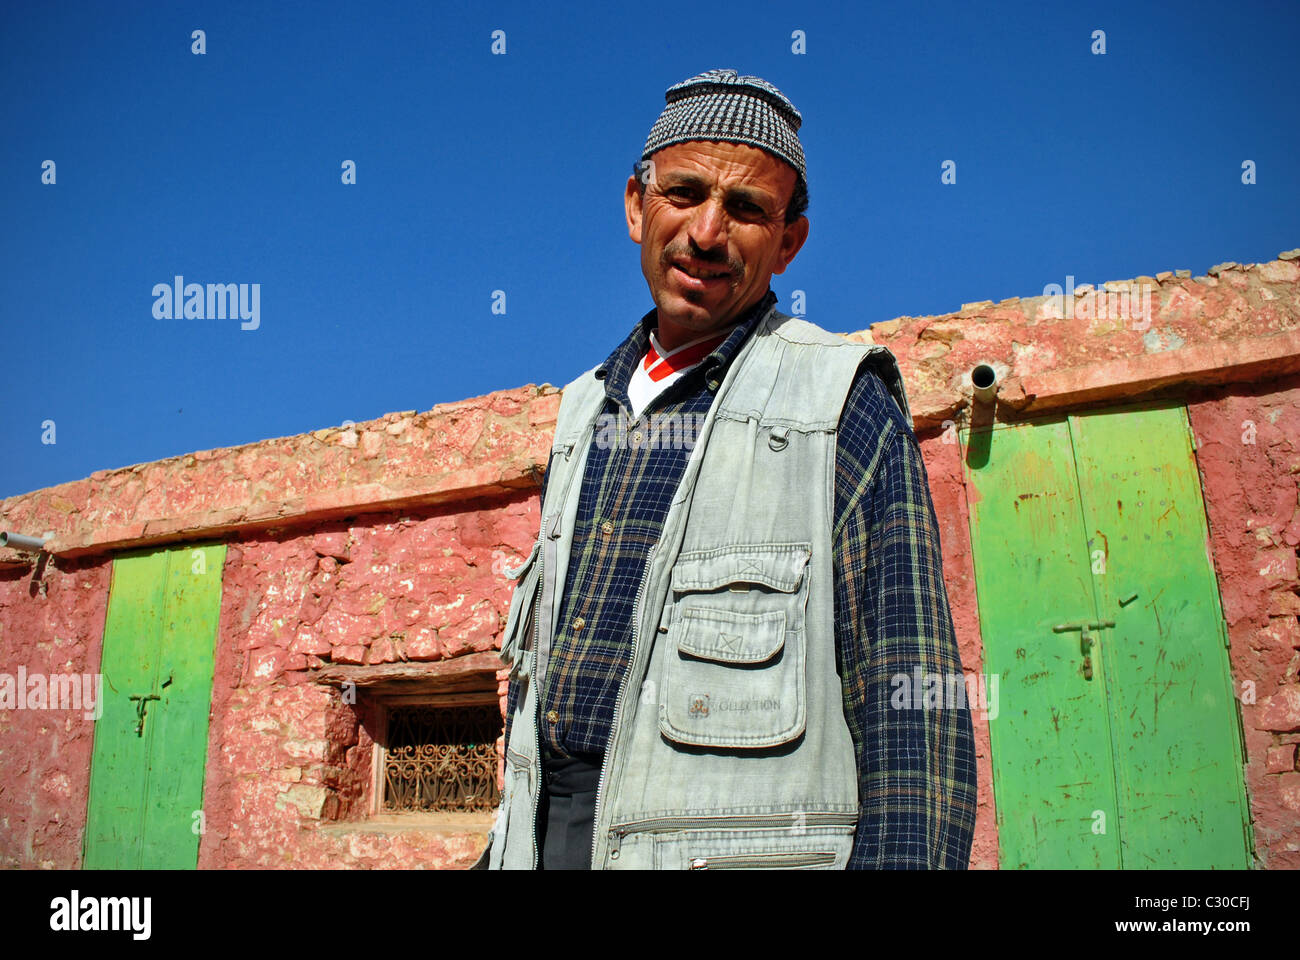 Retrato de pared colorida en Immouzzer, Marruecos Imagen De Stock